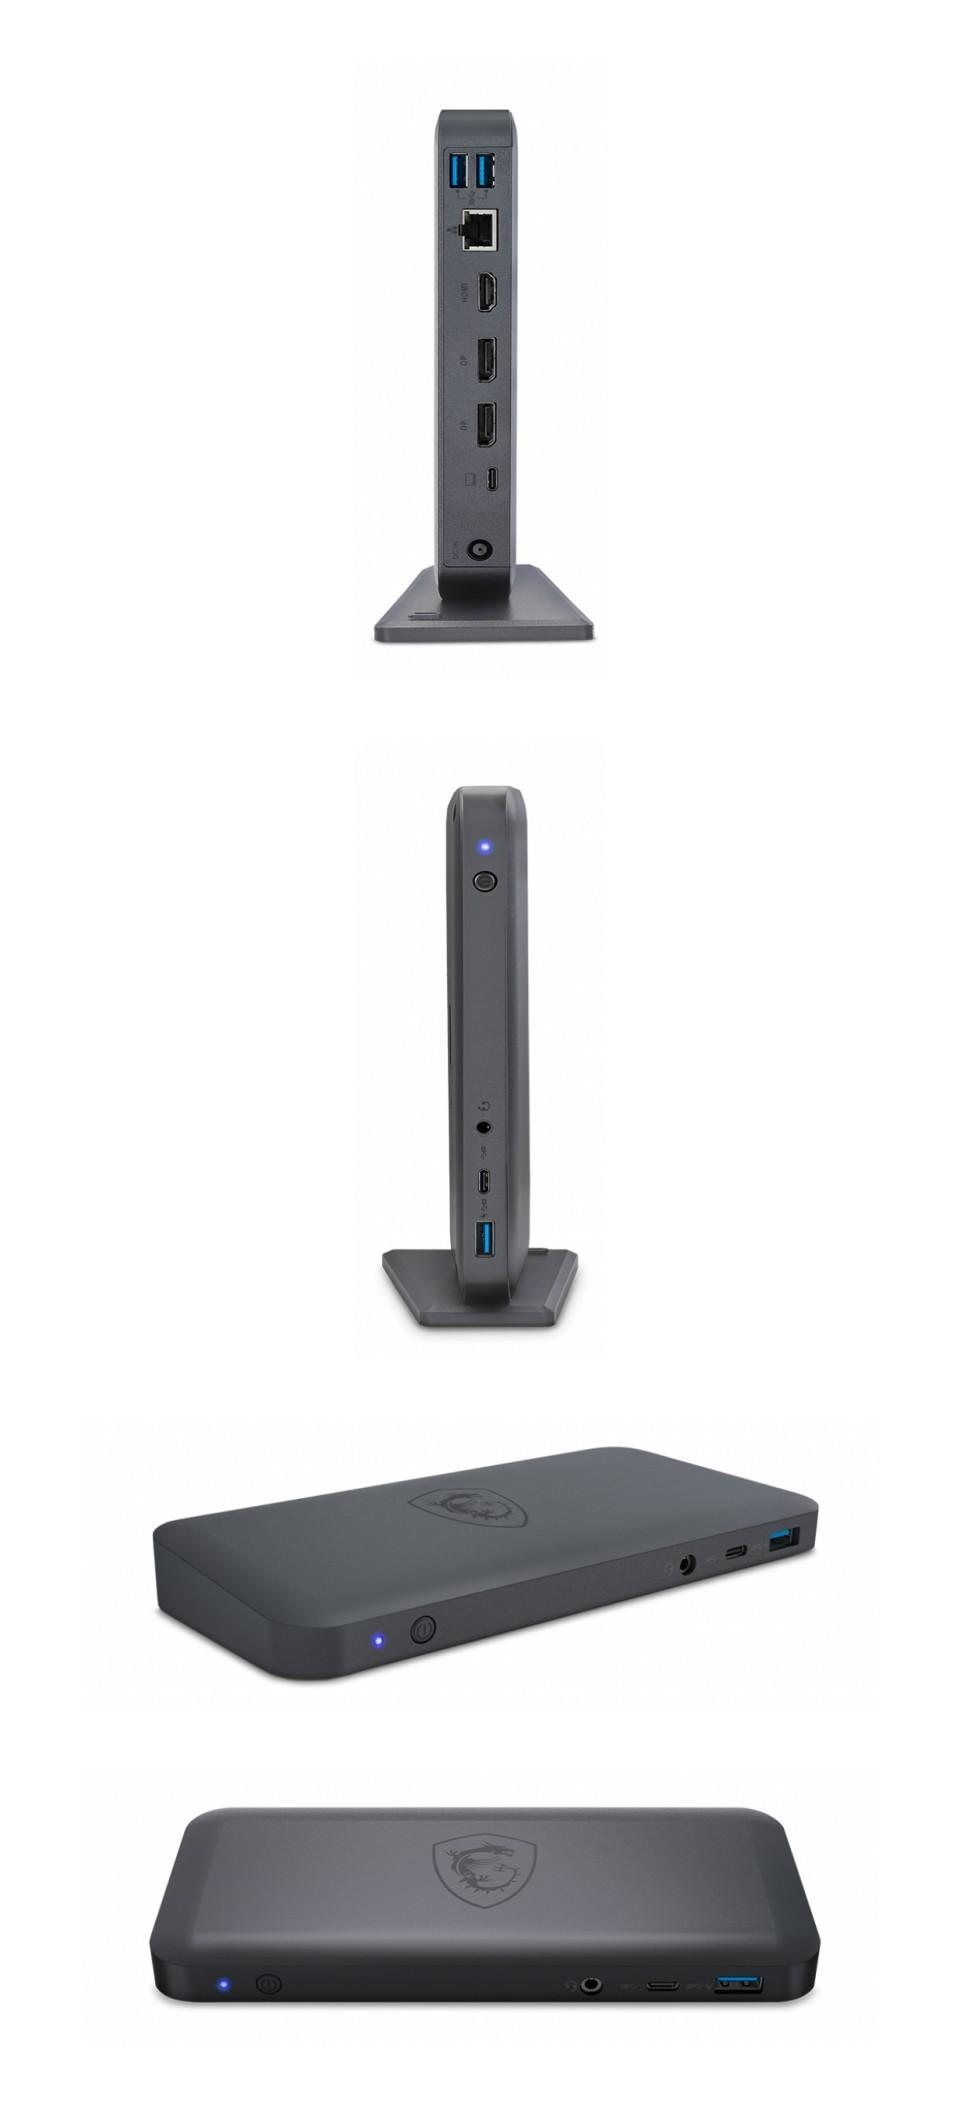 MSI USB-C Docking Station product